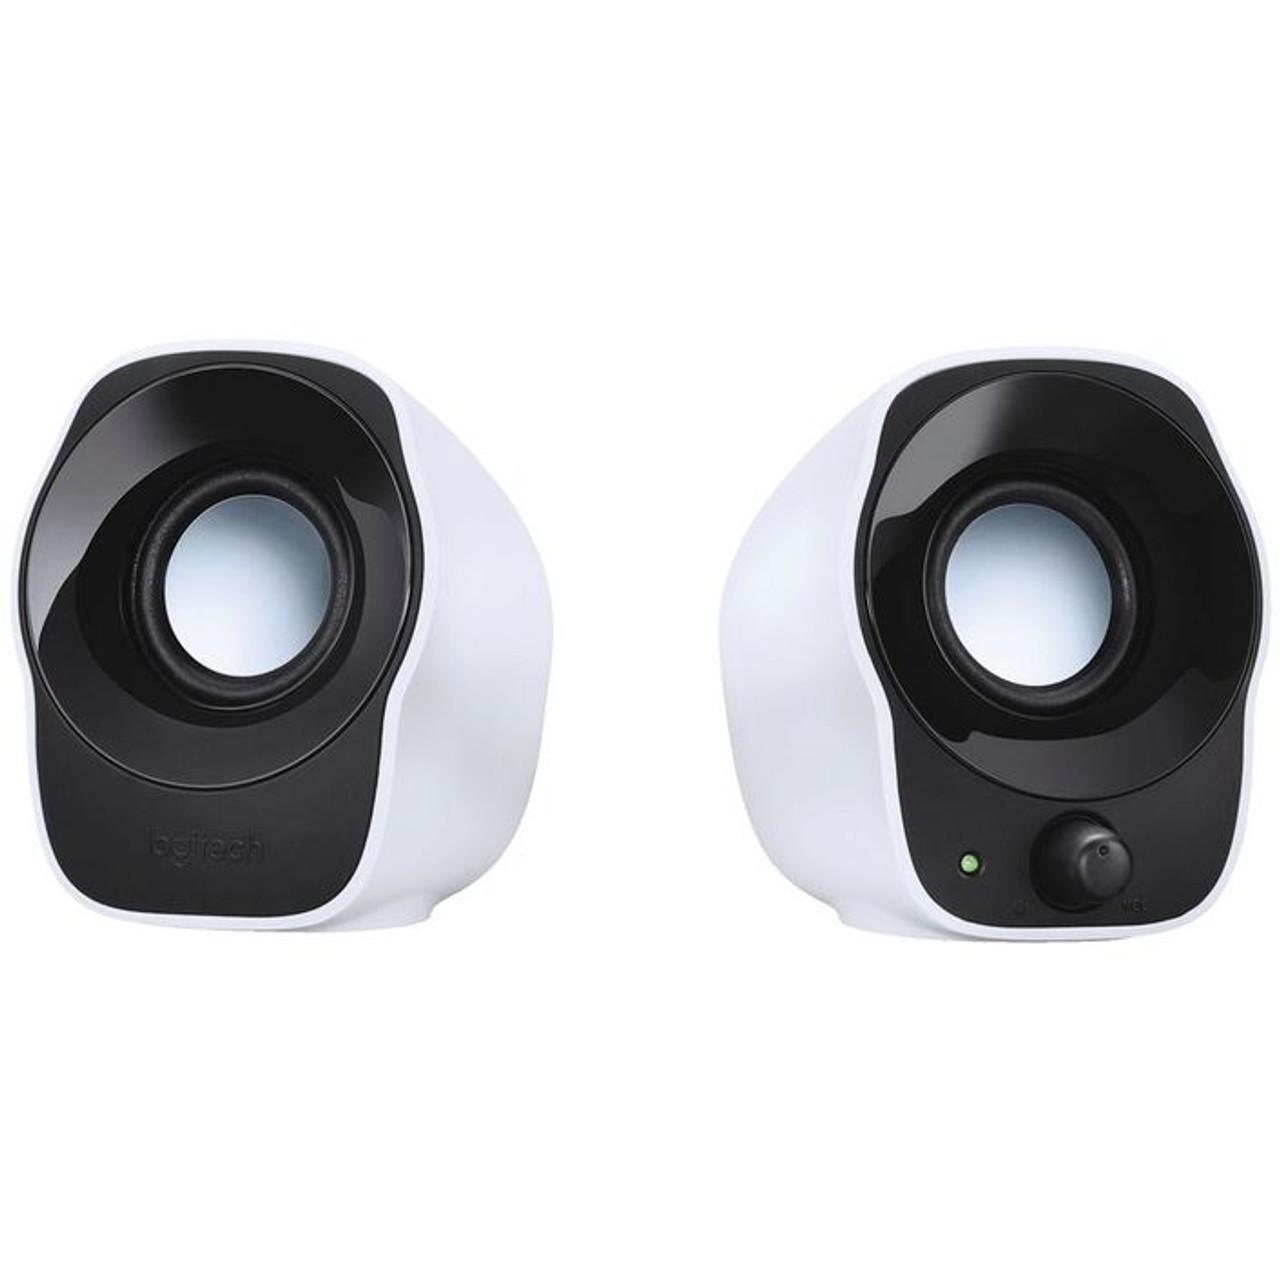 4a2b230c983 Logitech Z120 Stereo Speakers- White | Logitechshop